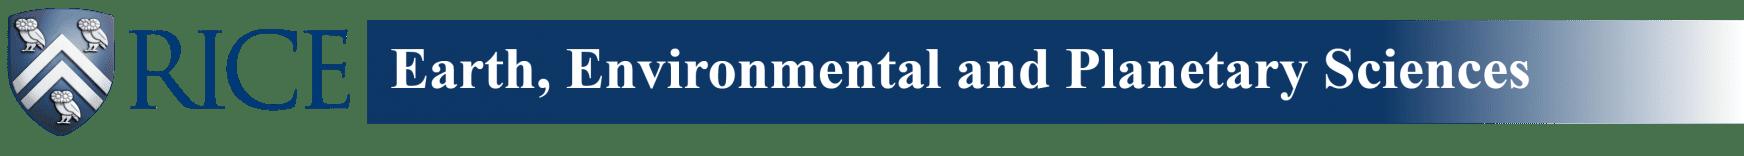 Rice Earth, Environmental & Planetary Sciences